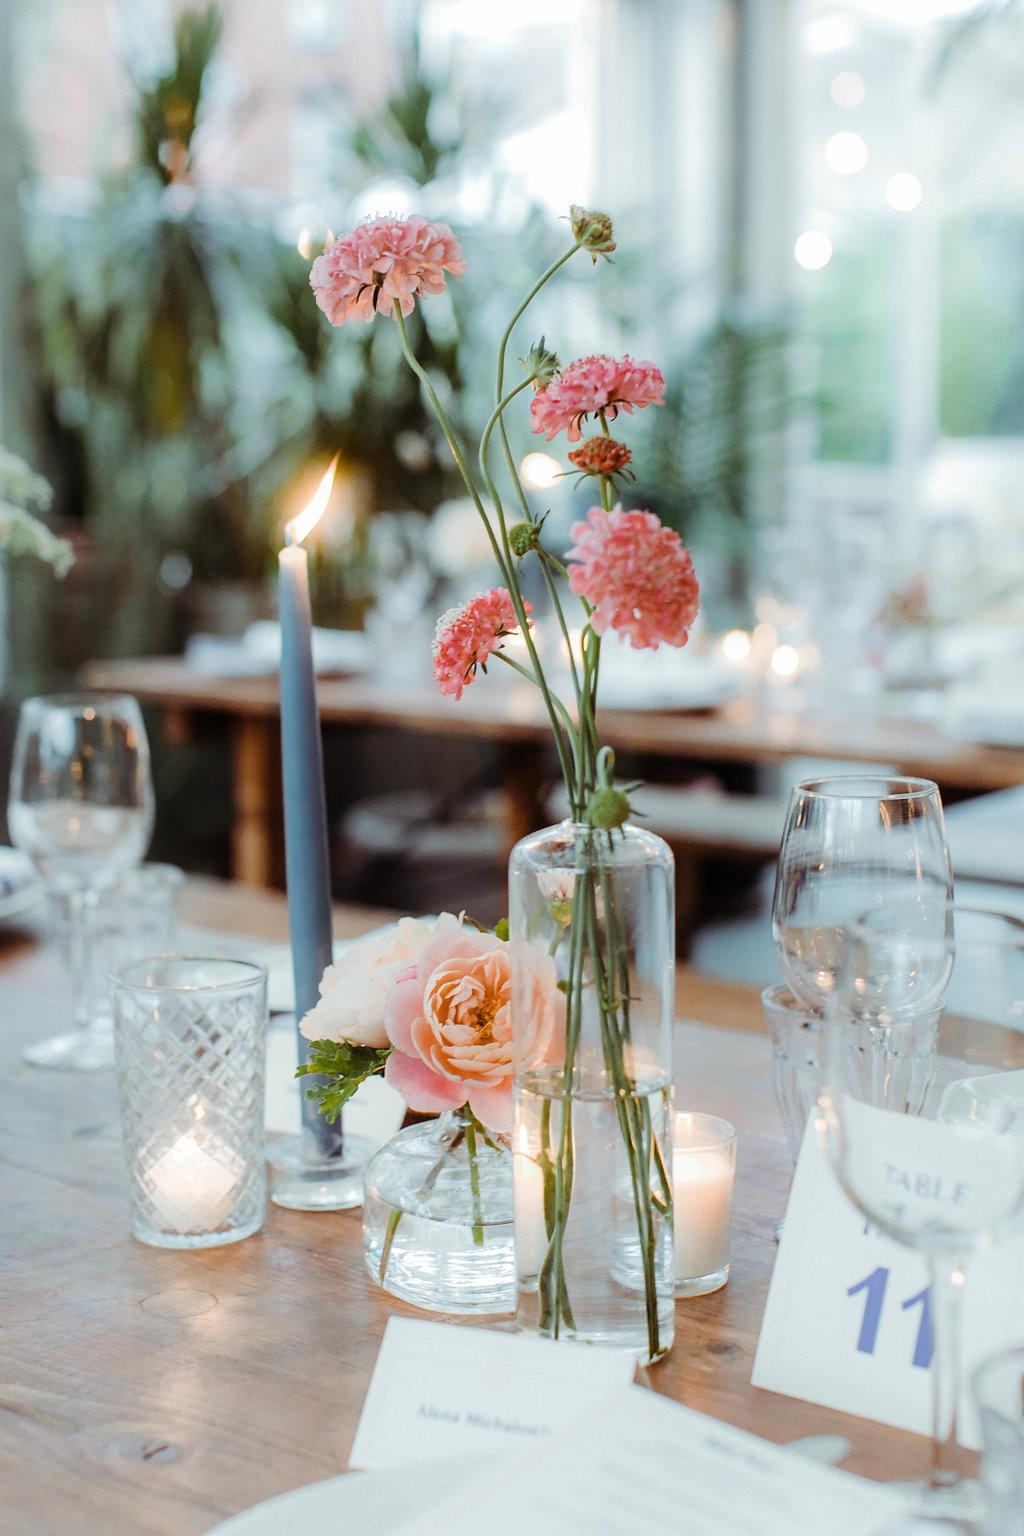 conservatory-garden-wedding-amber-gress-0458- (1).jpg